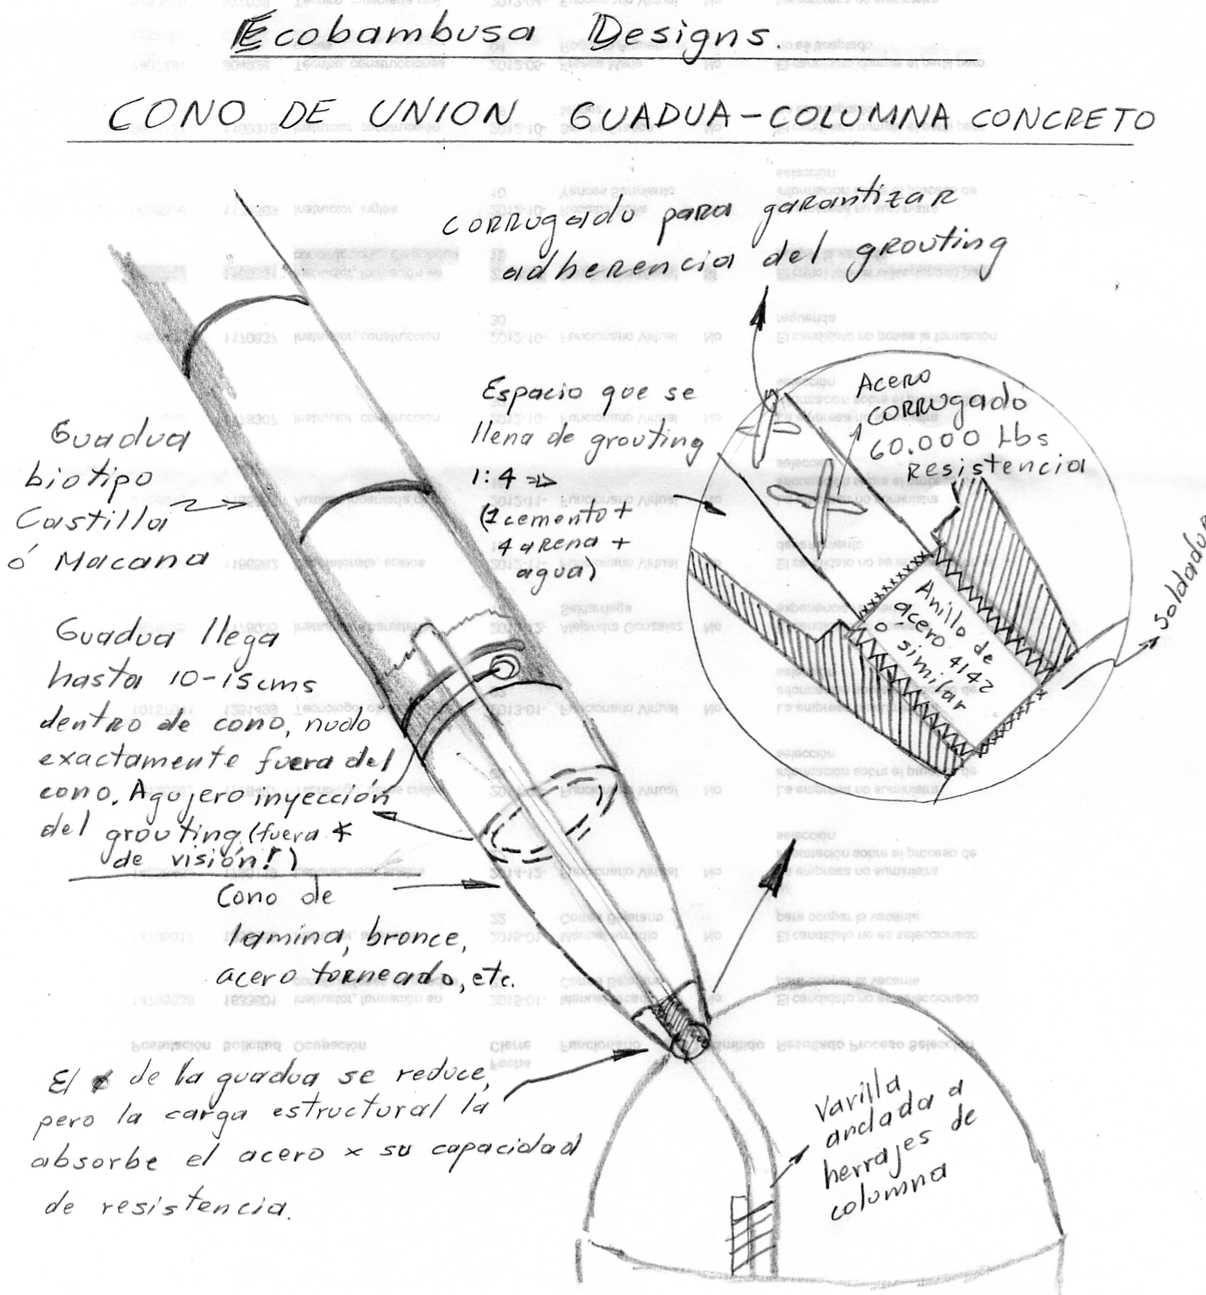 Union De Cono A Columna De Concreto  Details  Ecobambusa